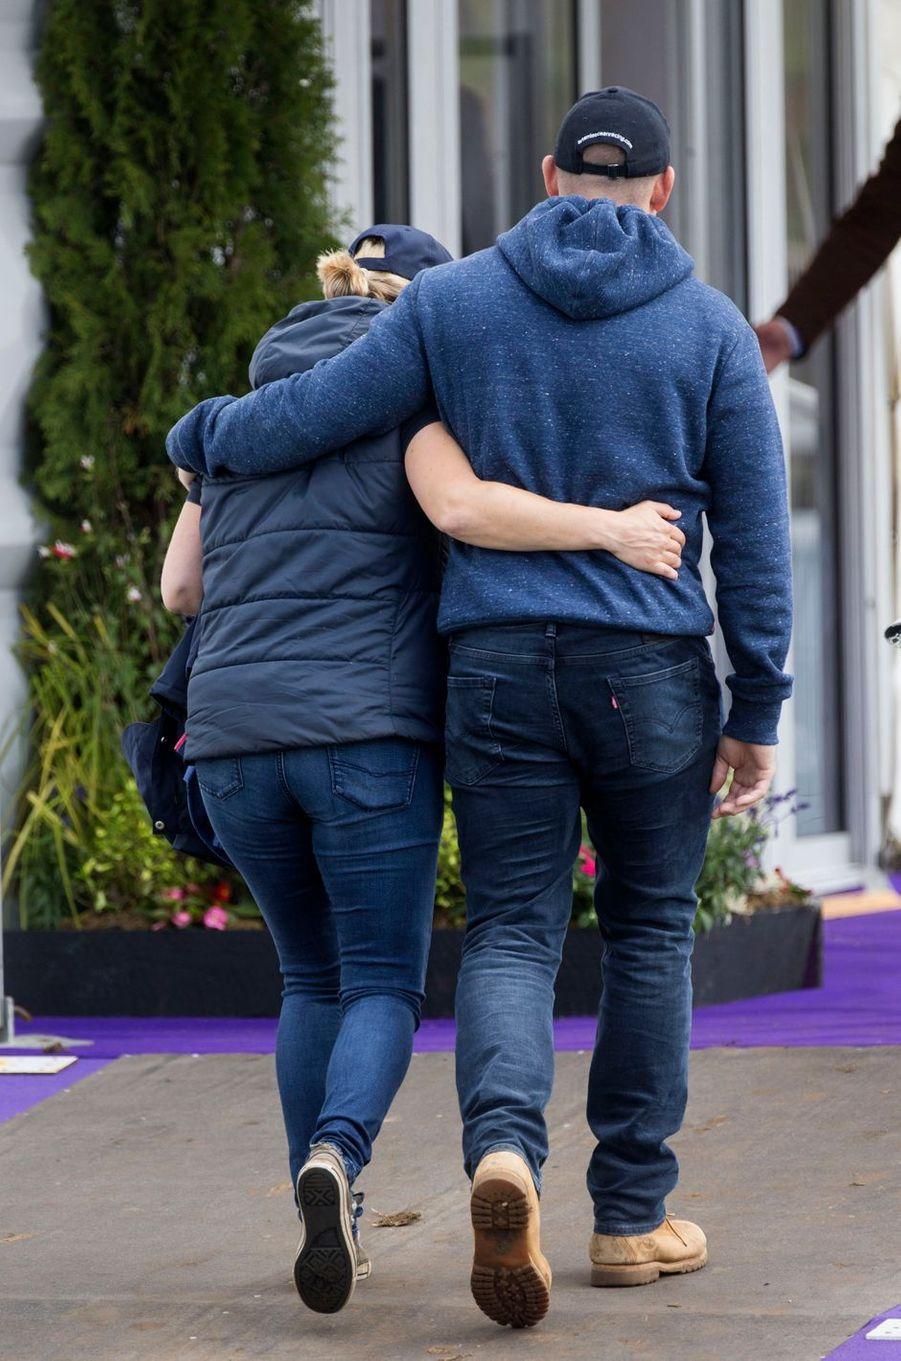 Zara Phillips et son mari Mike Tindall à Gatcombe Park, le 6 août 2017